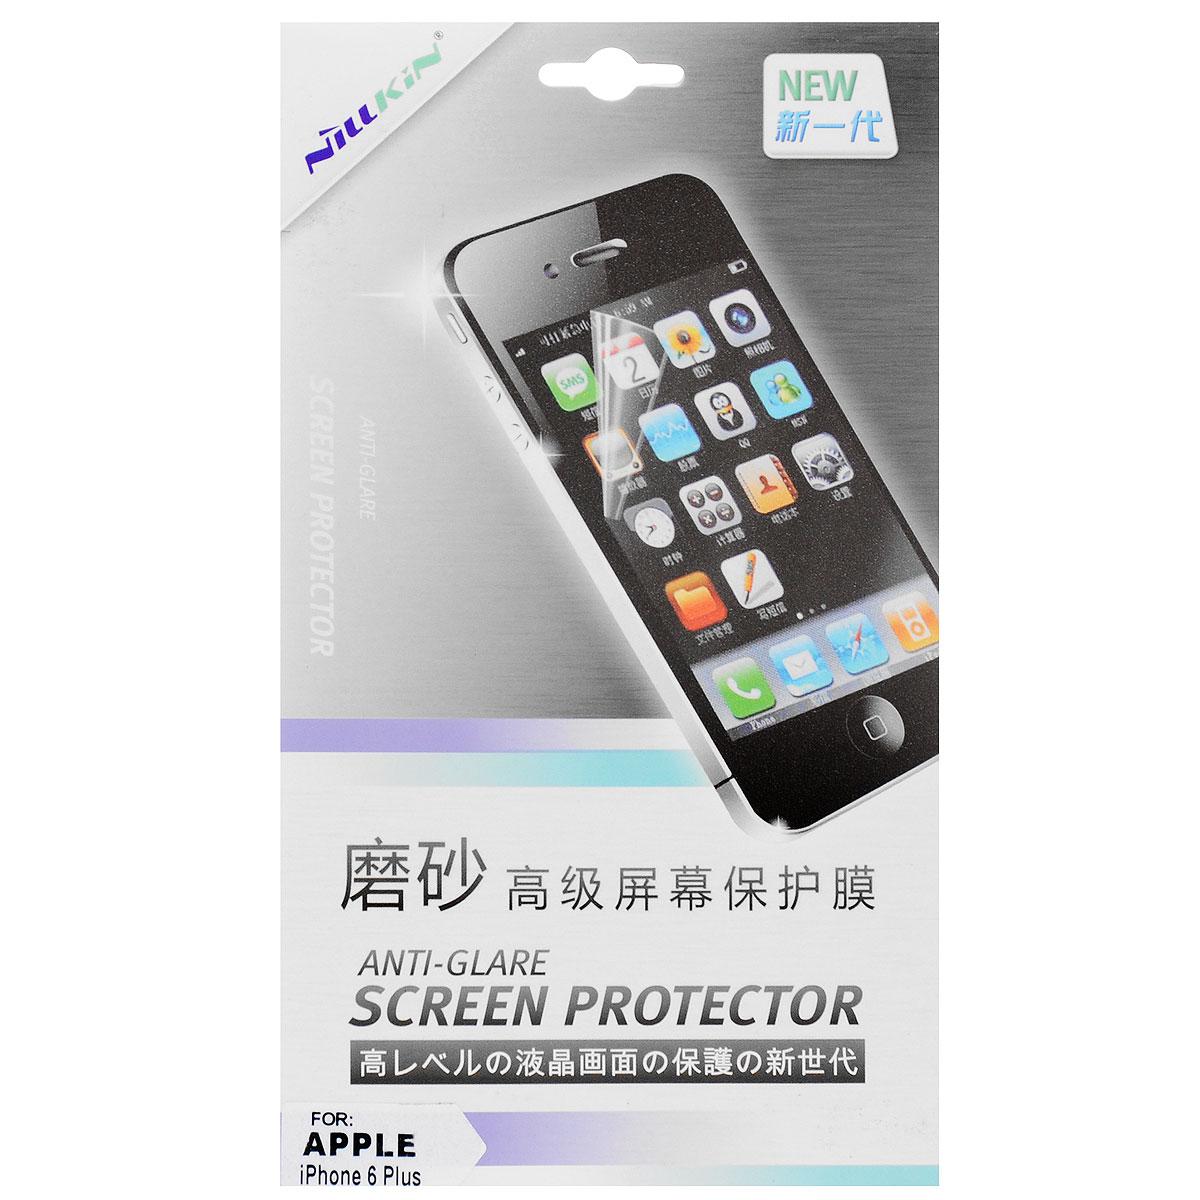 Nillkin Screen Protector защитная пленка для Apple iPhone 6 Plus, матовая